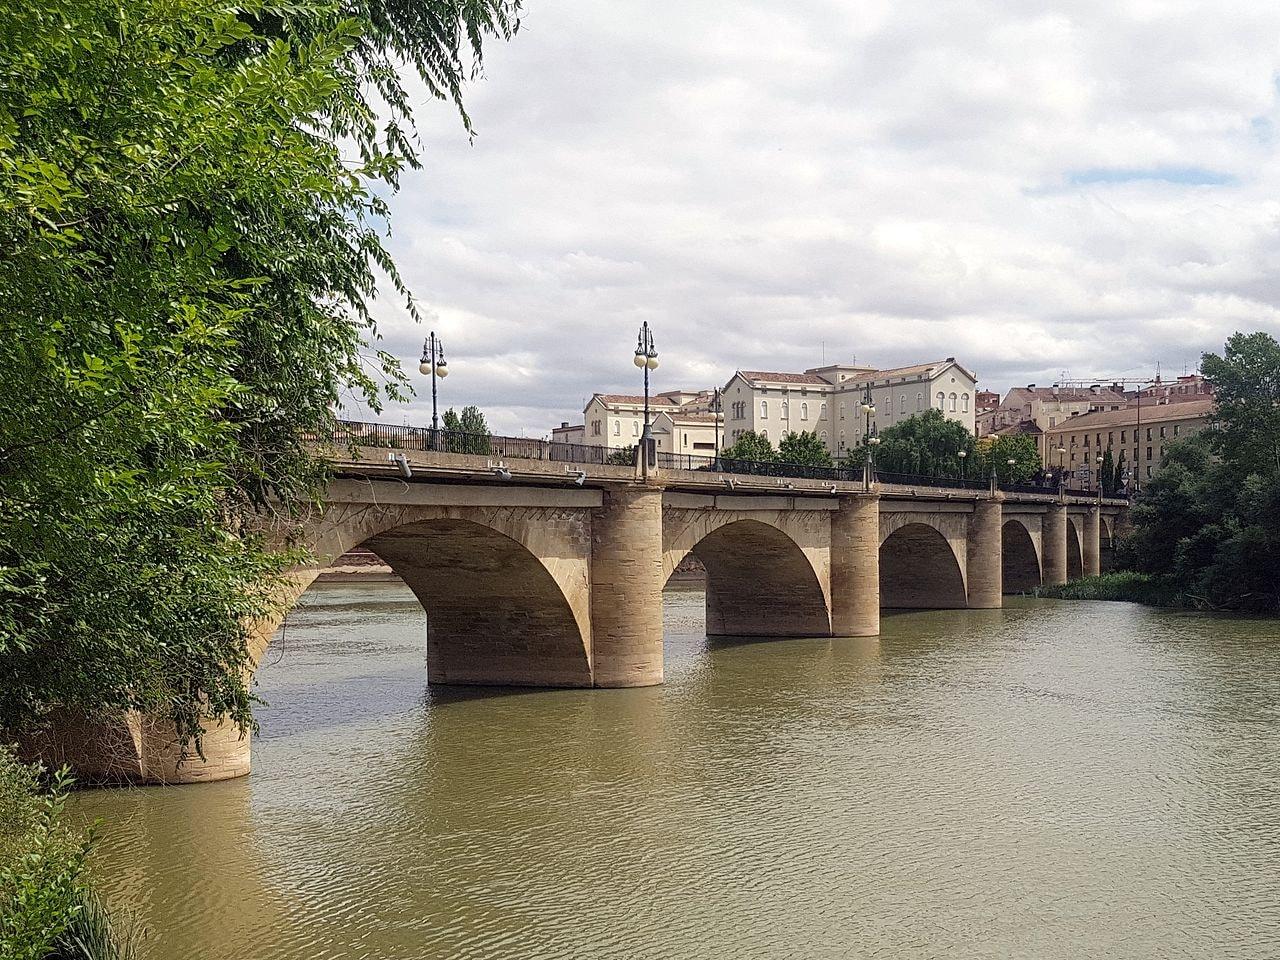 Puente de Piedra, Logroño, Spain | ©Jynus / Wikimedia Commons